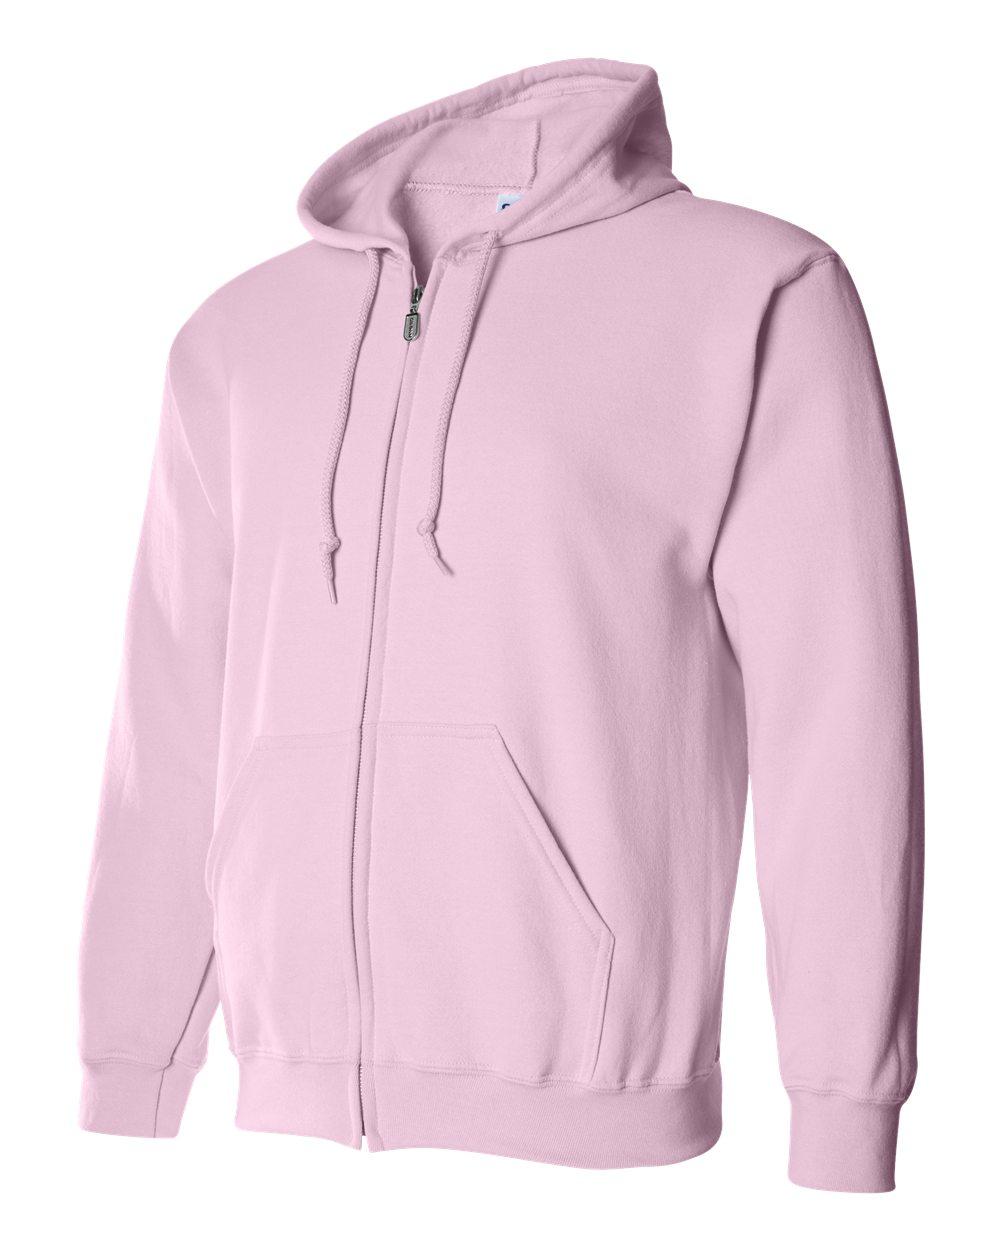 GIL18600 Light Pink